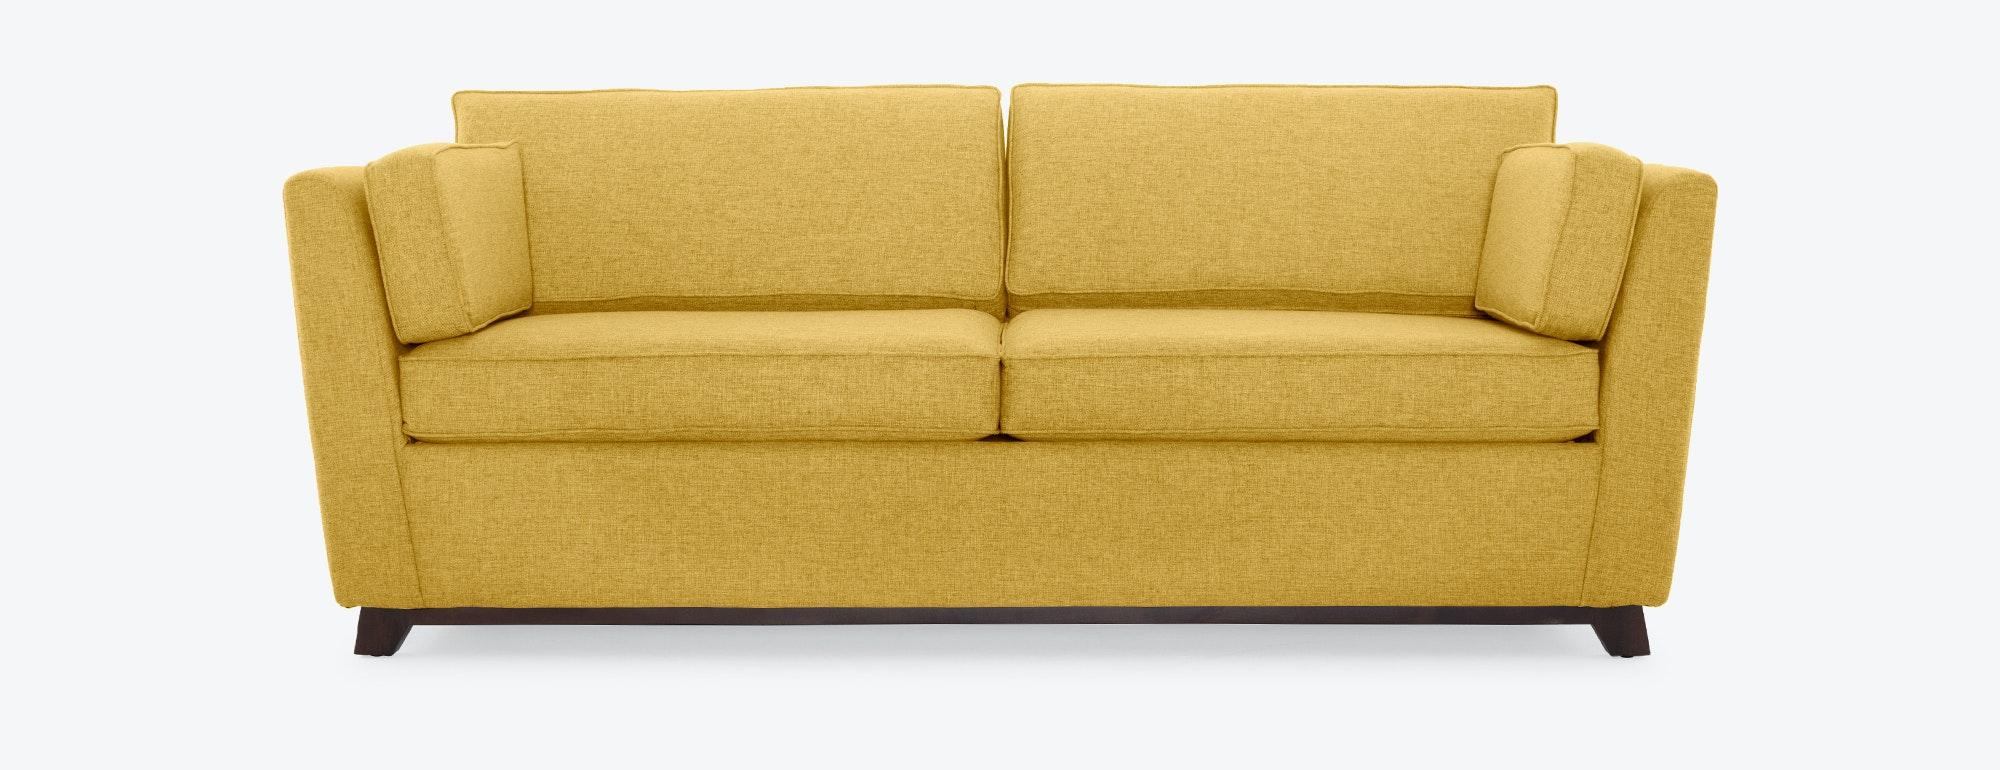 sleeper sofas chicago il restoration hardware lancaster sofa craigslist roller joybird main gallery image